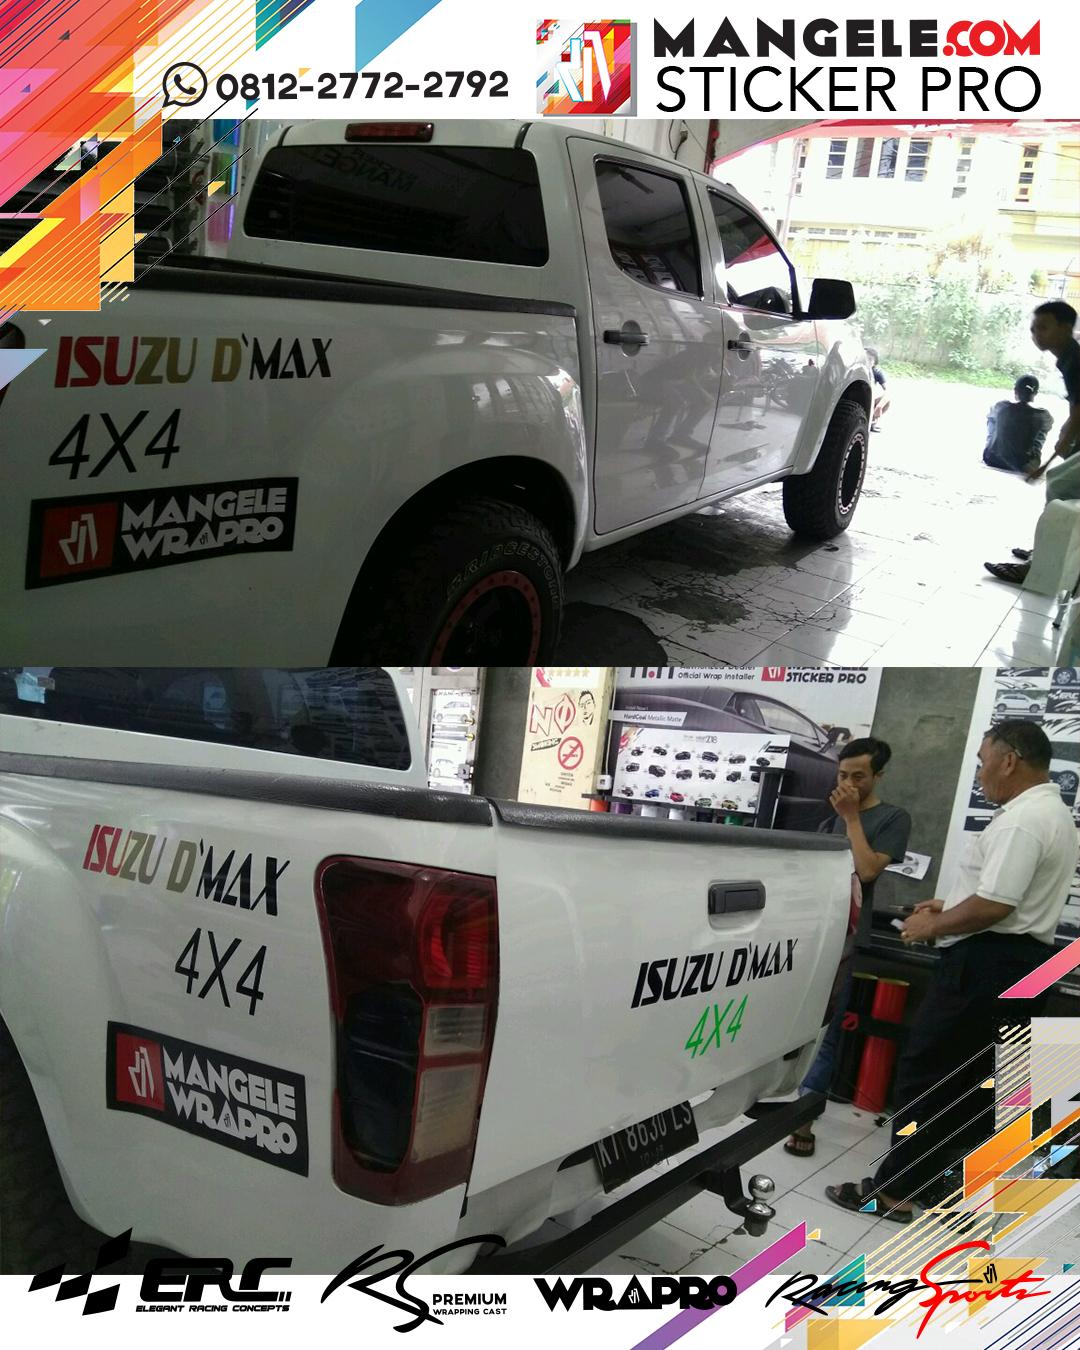 stiker cutting mobil | Cutting Isuzu D'Max | mangele stiker 081227722792